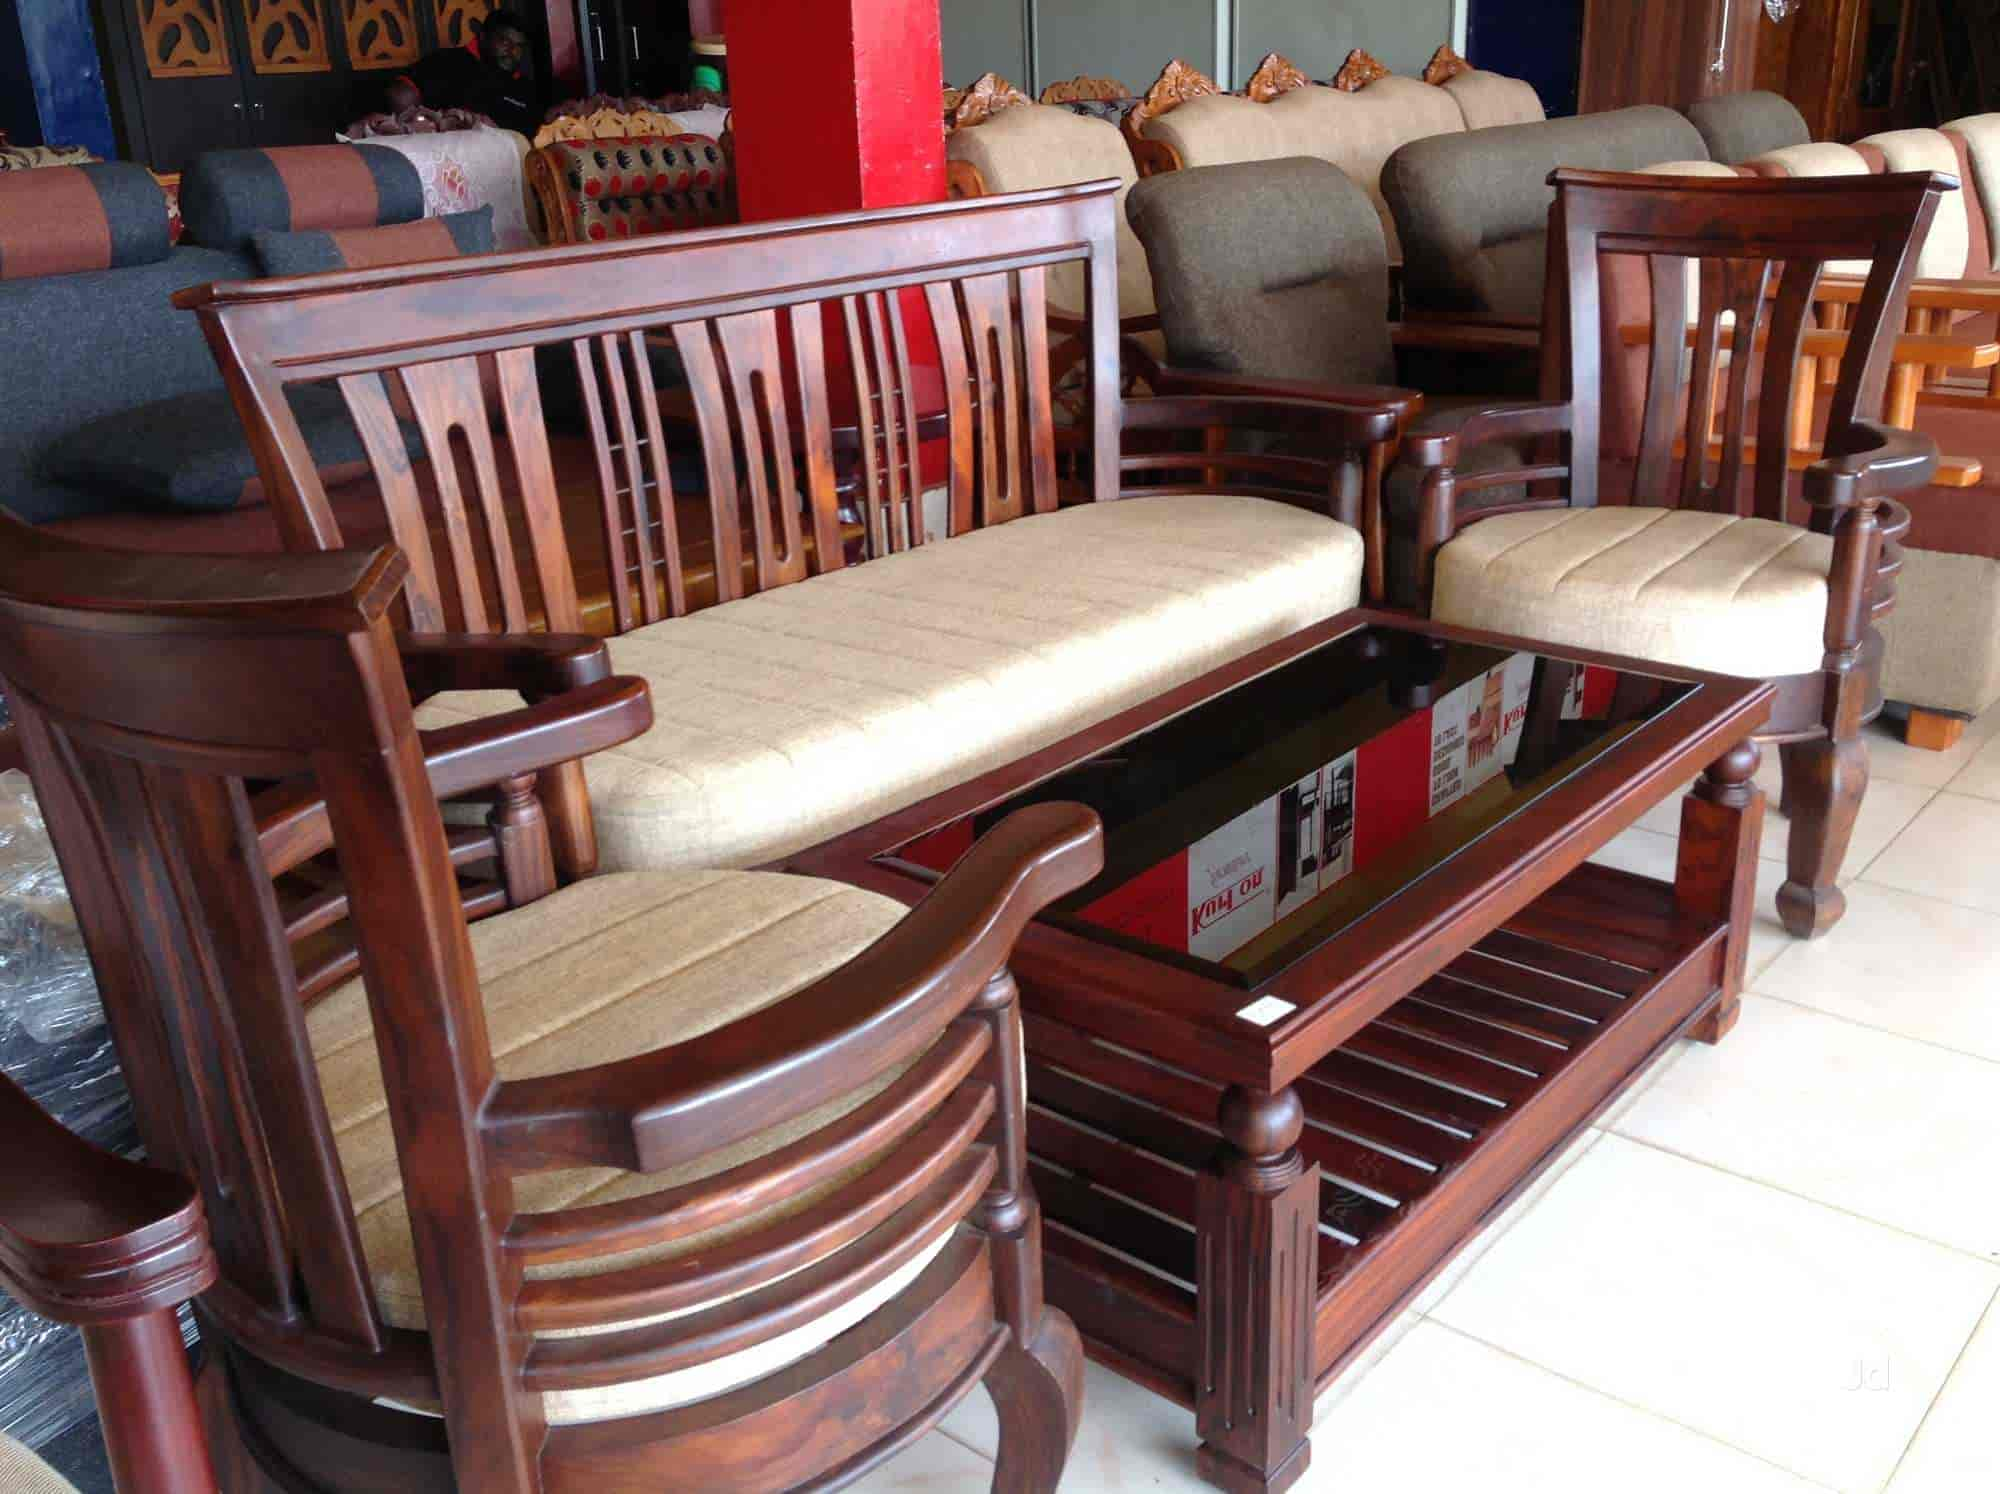 Royal Furniture Kodimatha Kottayam Furniture Dealers In Kottayam